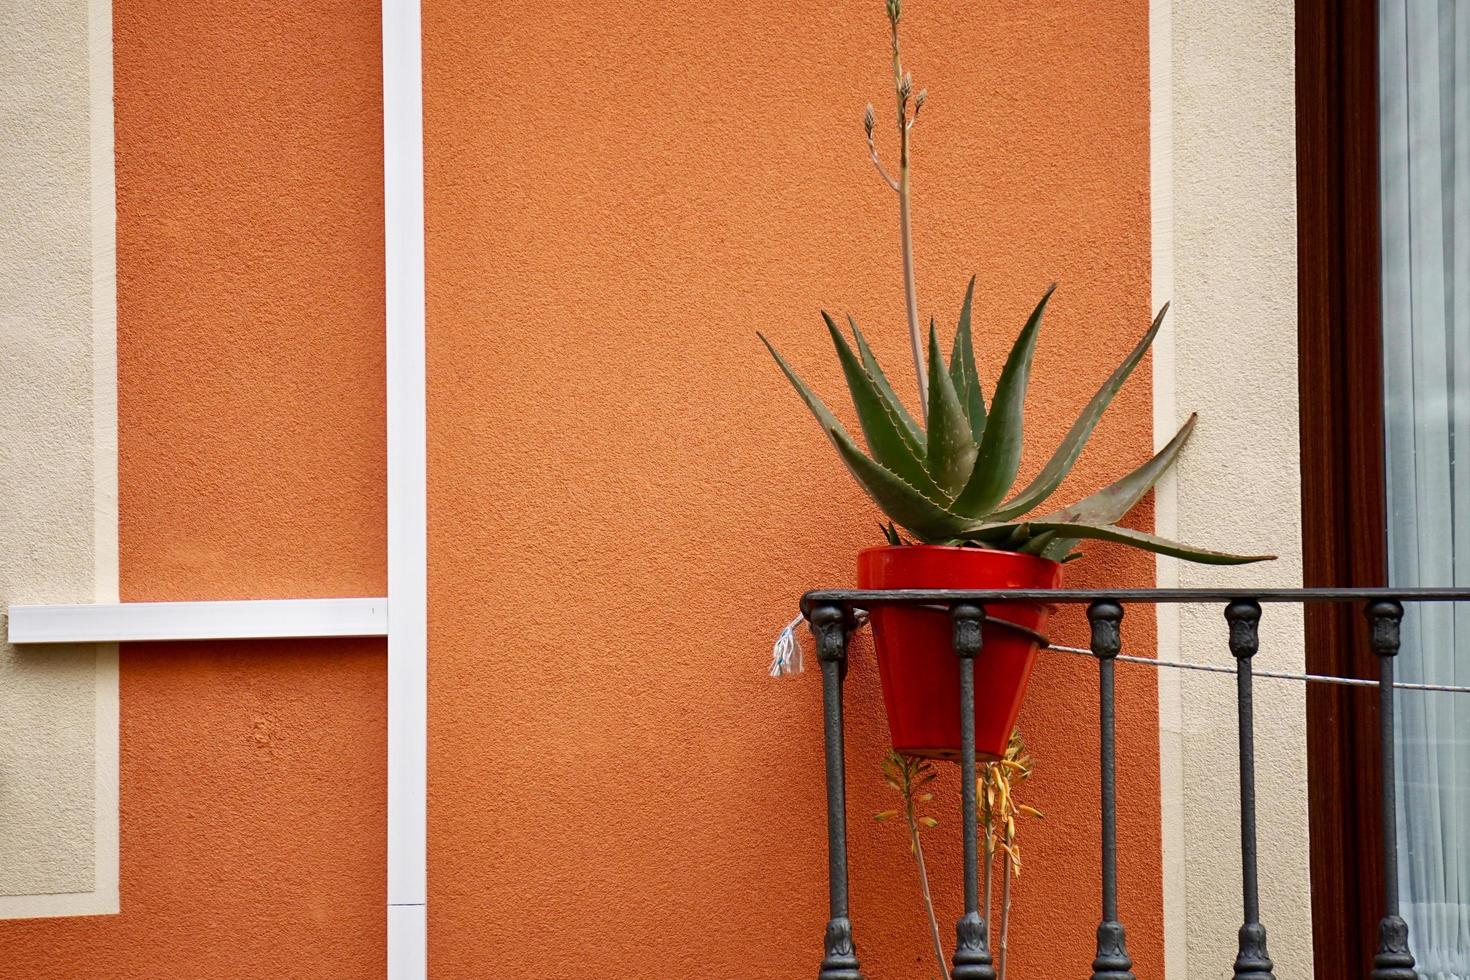 lindas plantas na rua foto